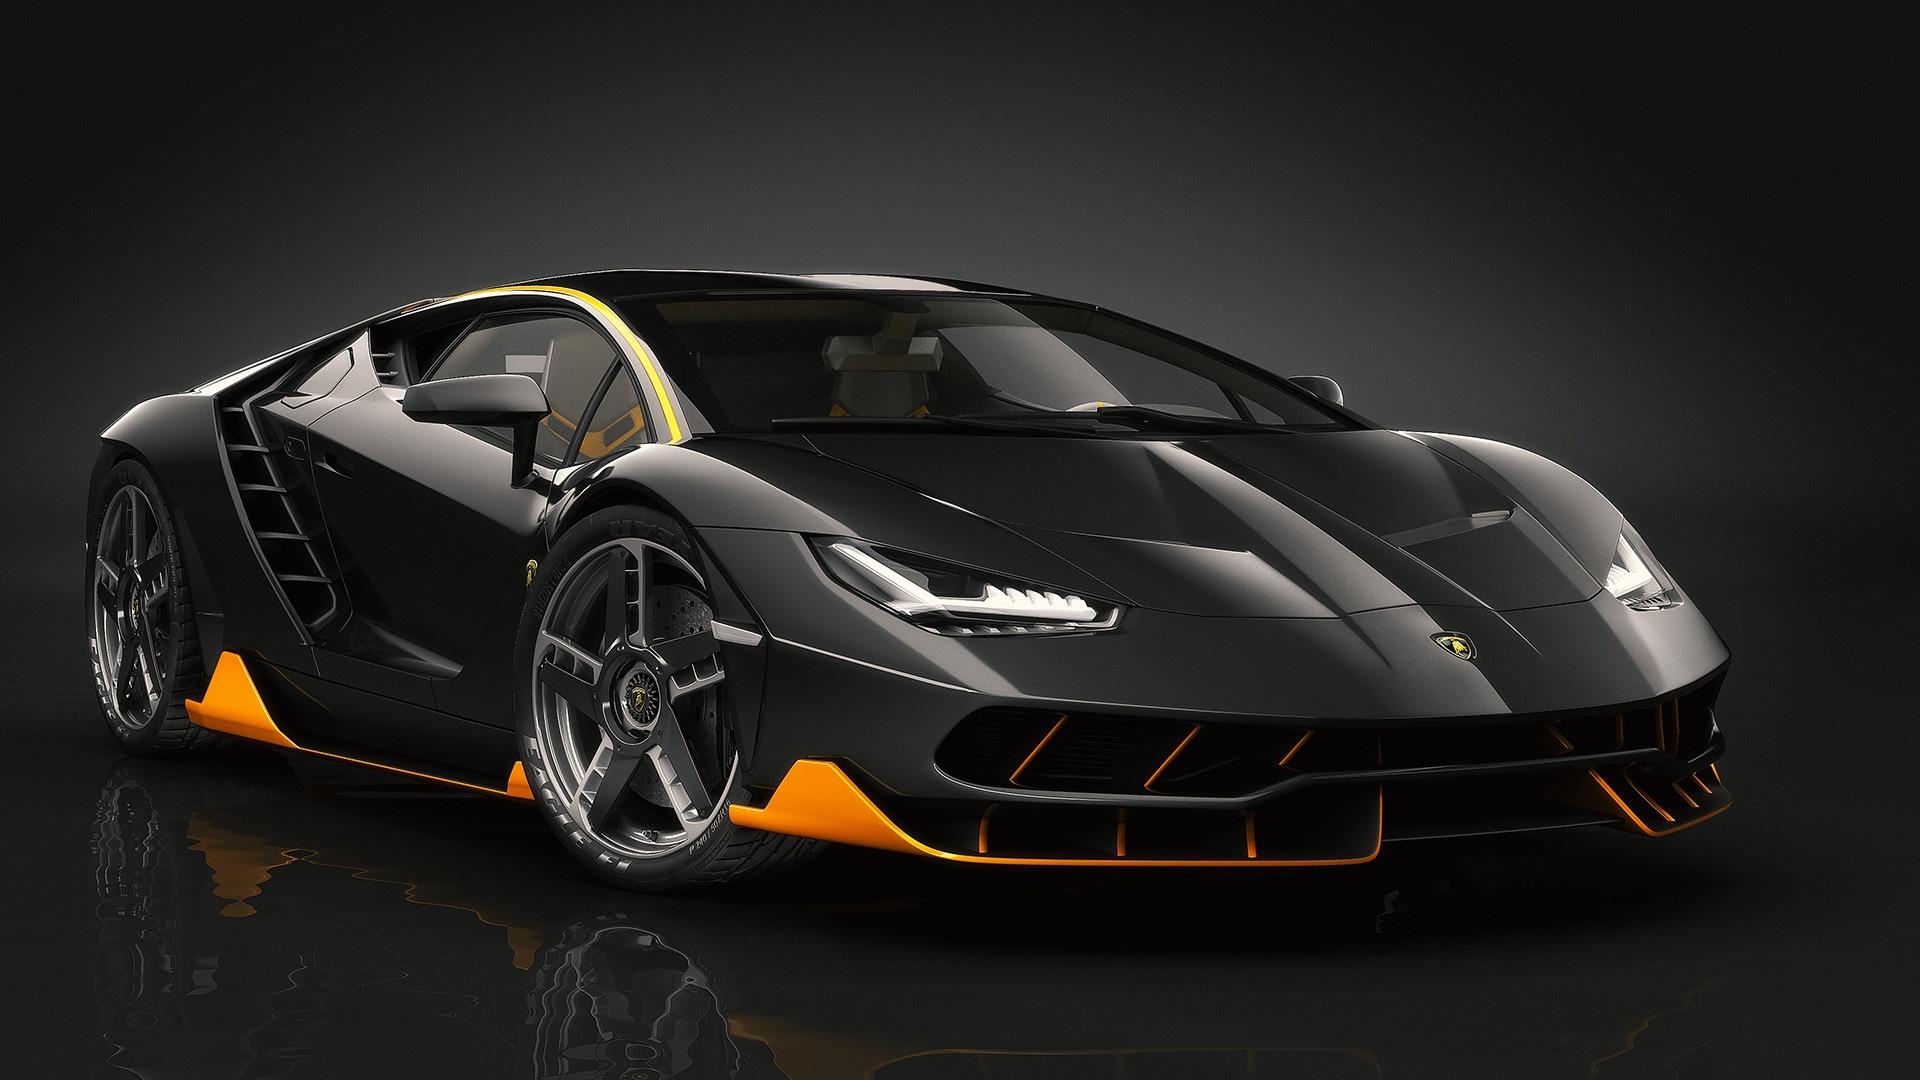 Wallpaper : car, supercars, vehicle, Lamborghini, black ...